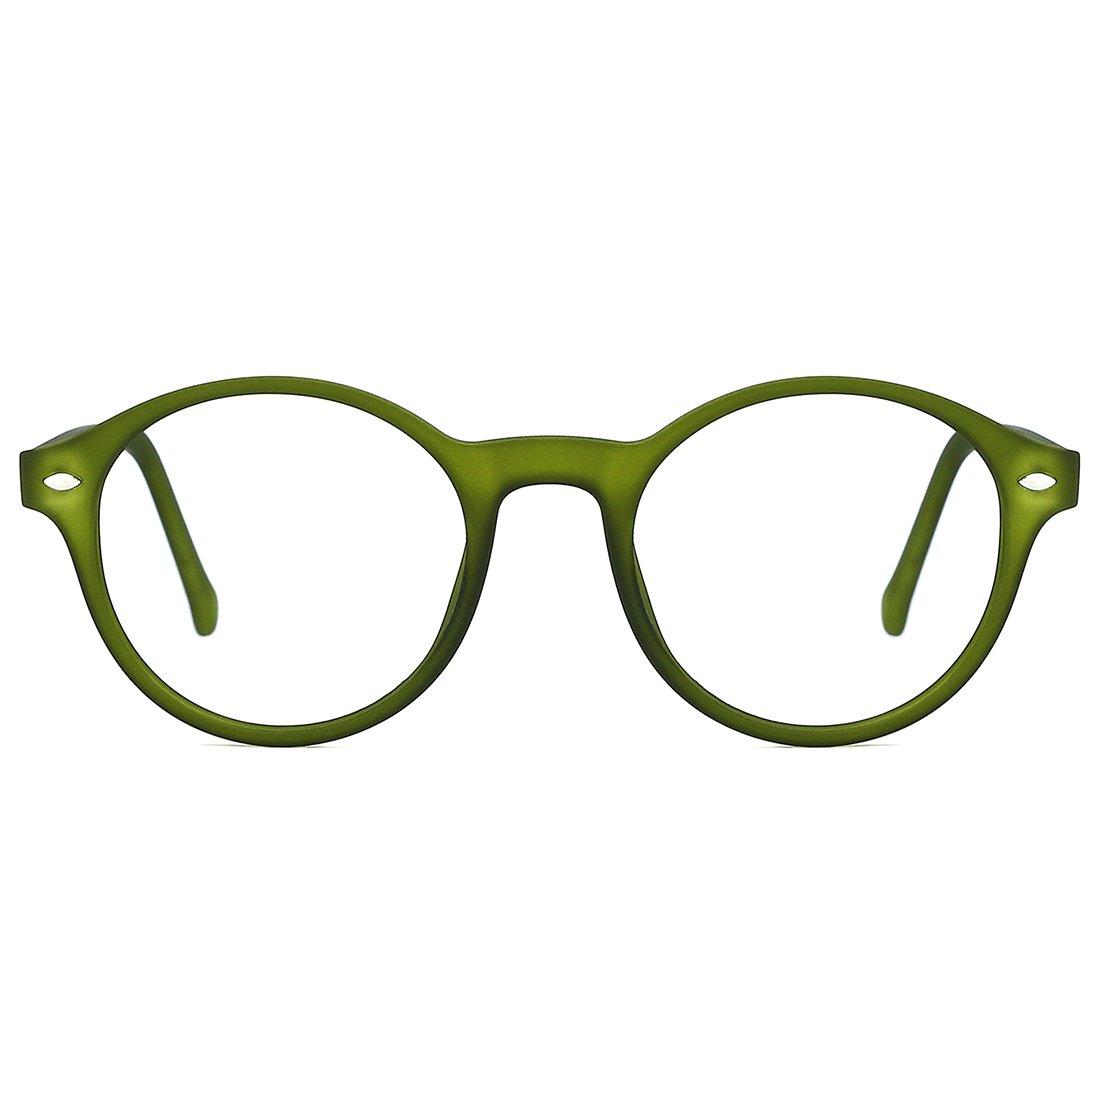 TIJN Men Women Classic Round Non-prescription Glasses Frosted Eyeglasses Frame (green, 48)